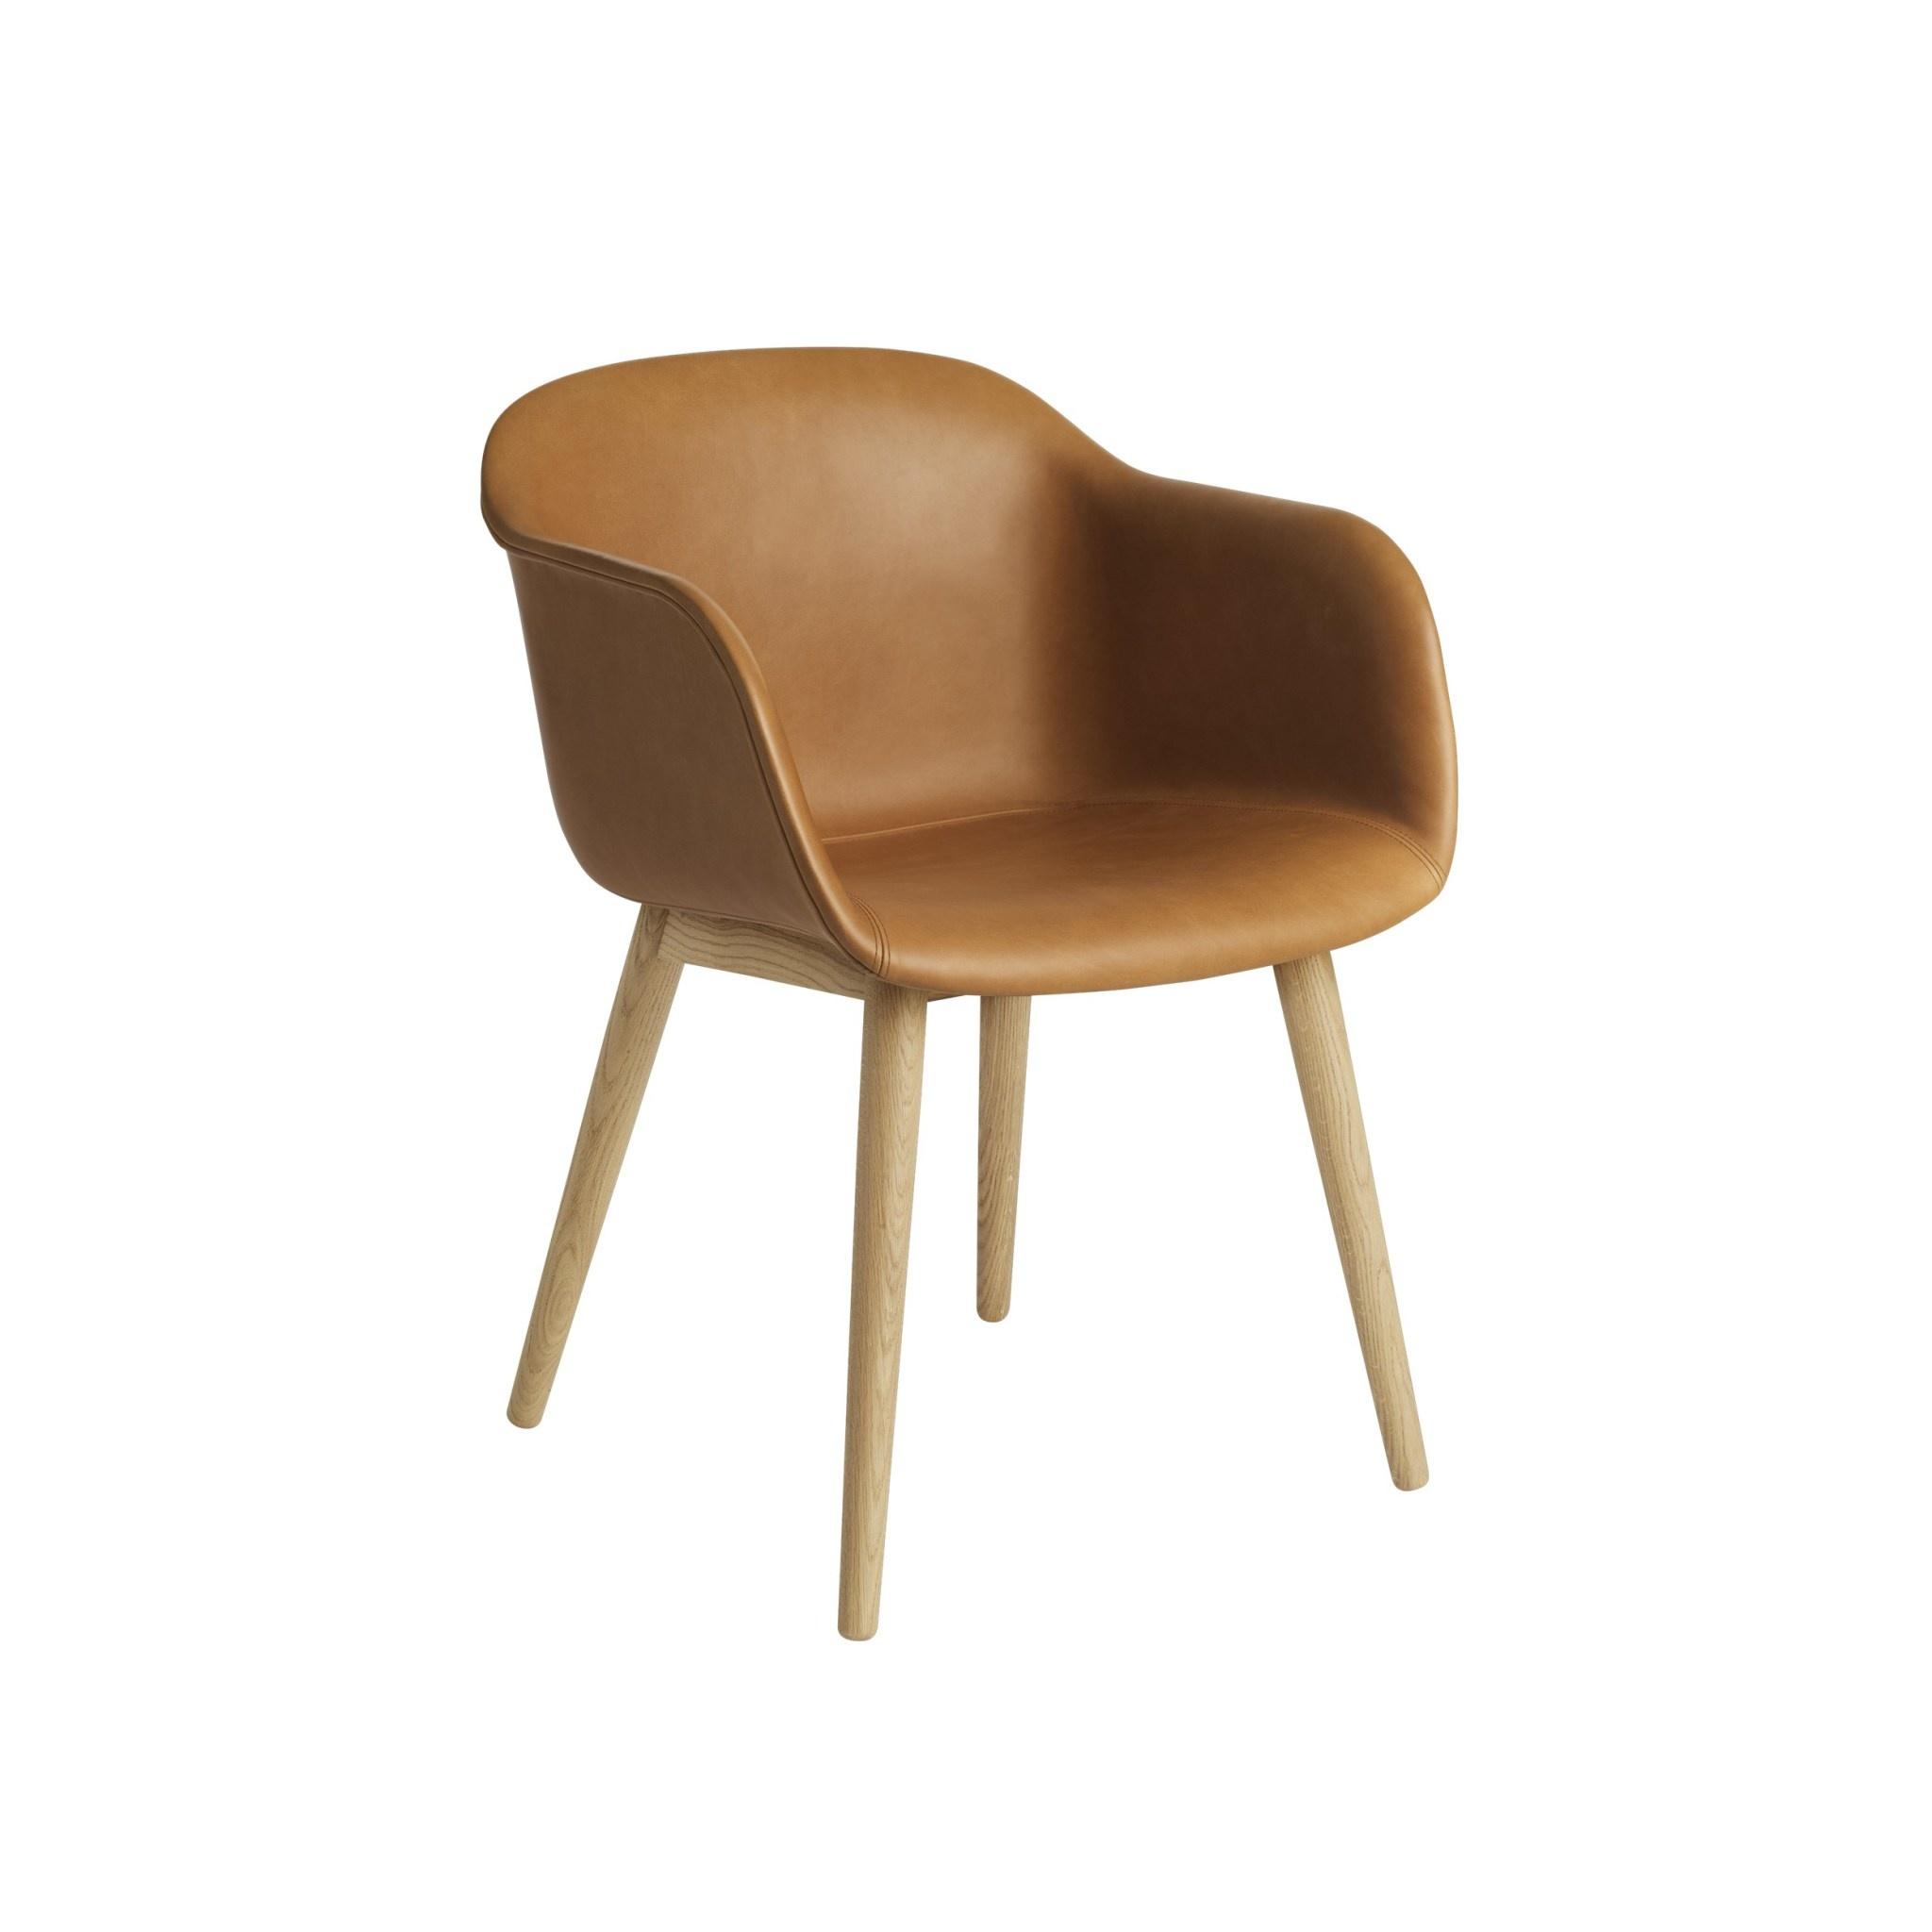 Fiber armchair wood base-4